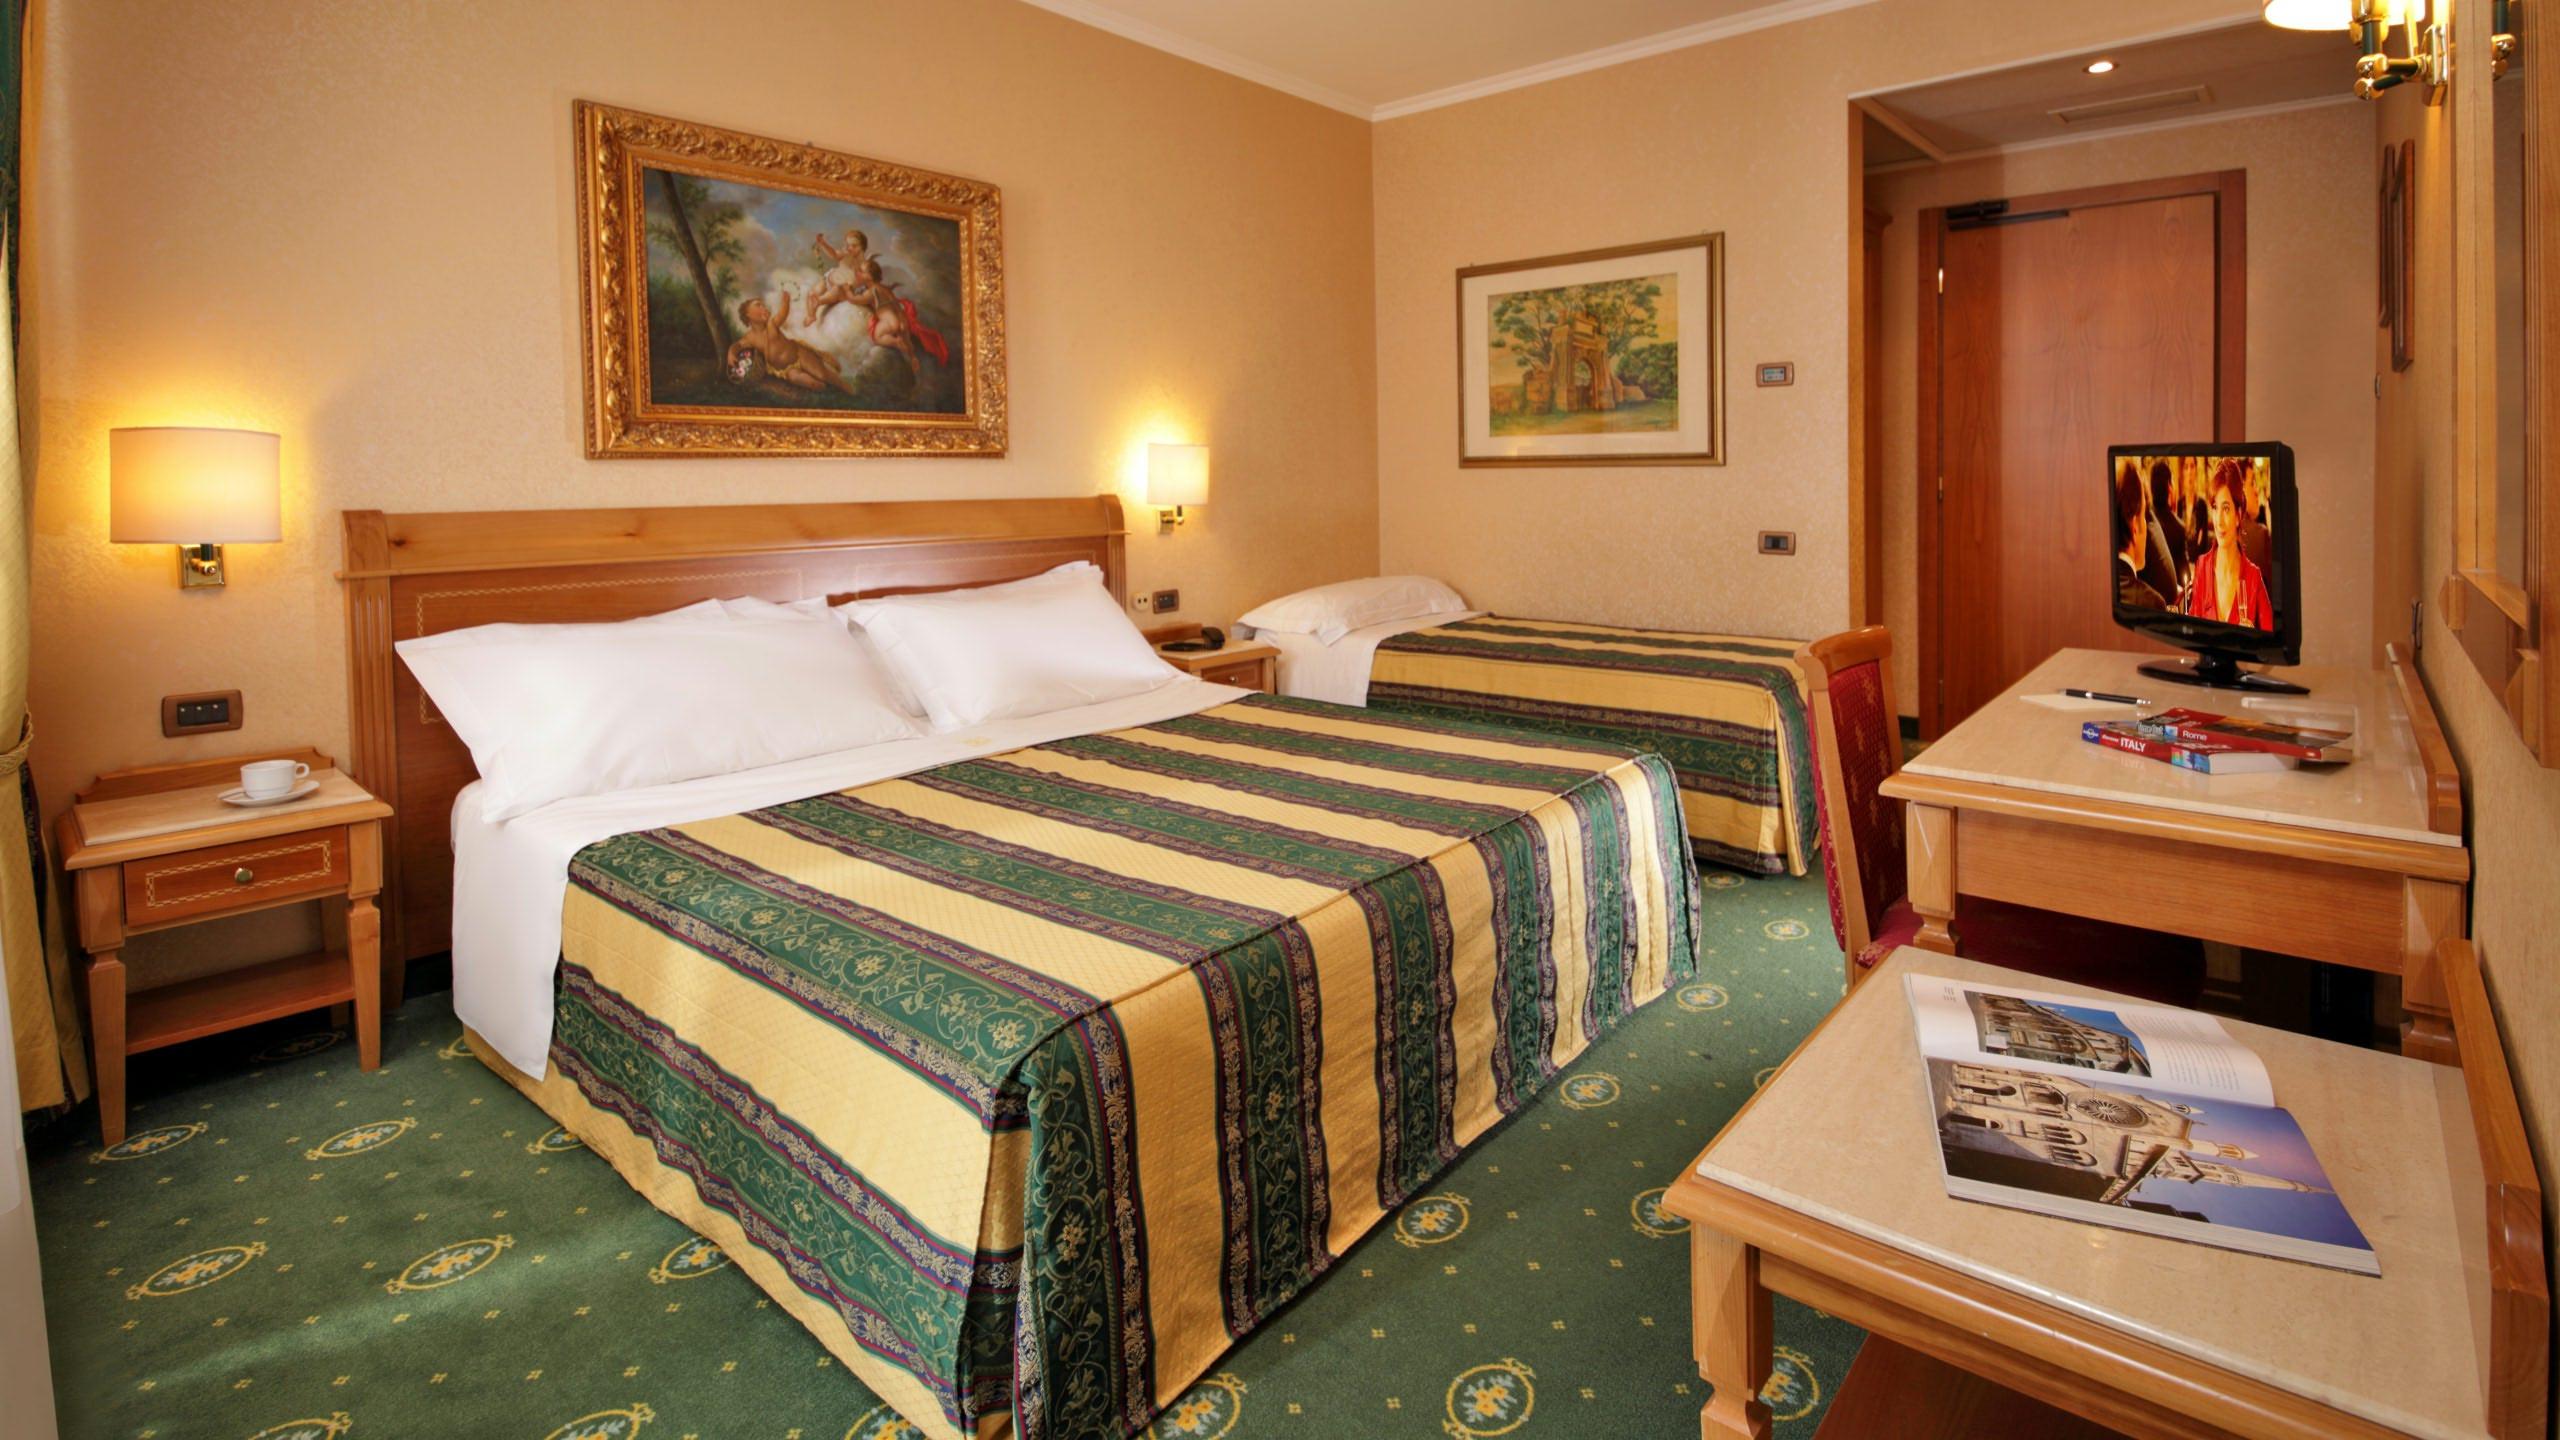 Hotel-Colonna-Frascati-camera-9